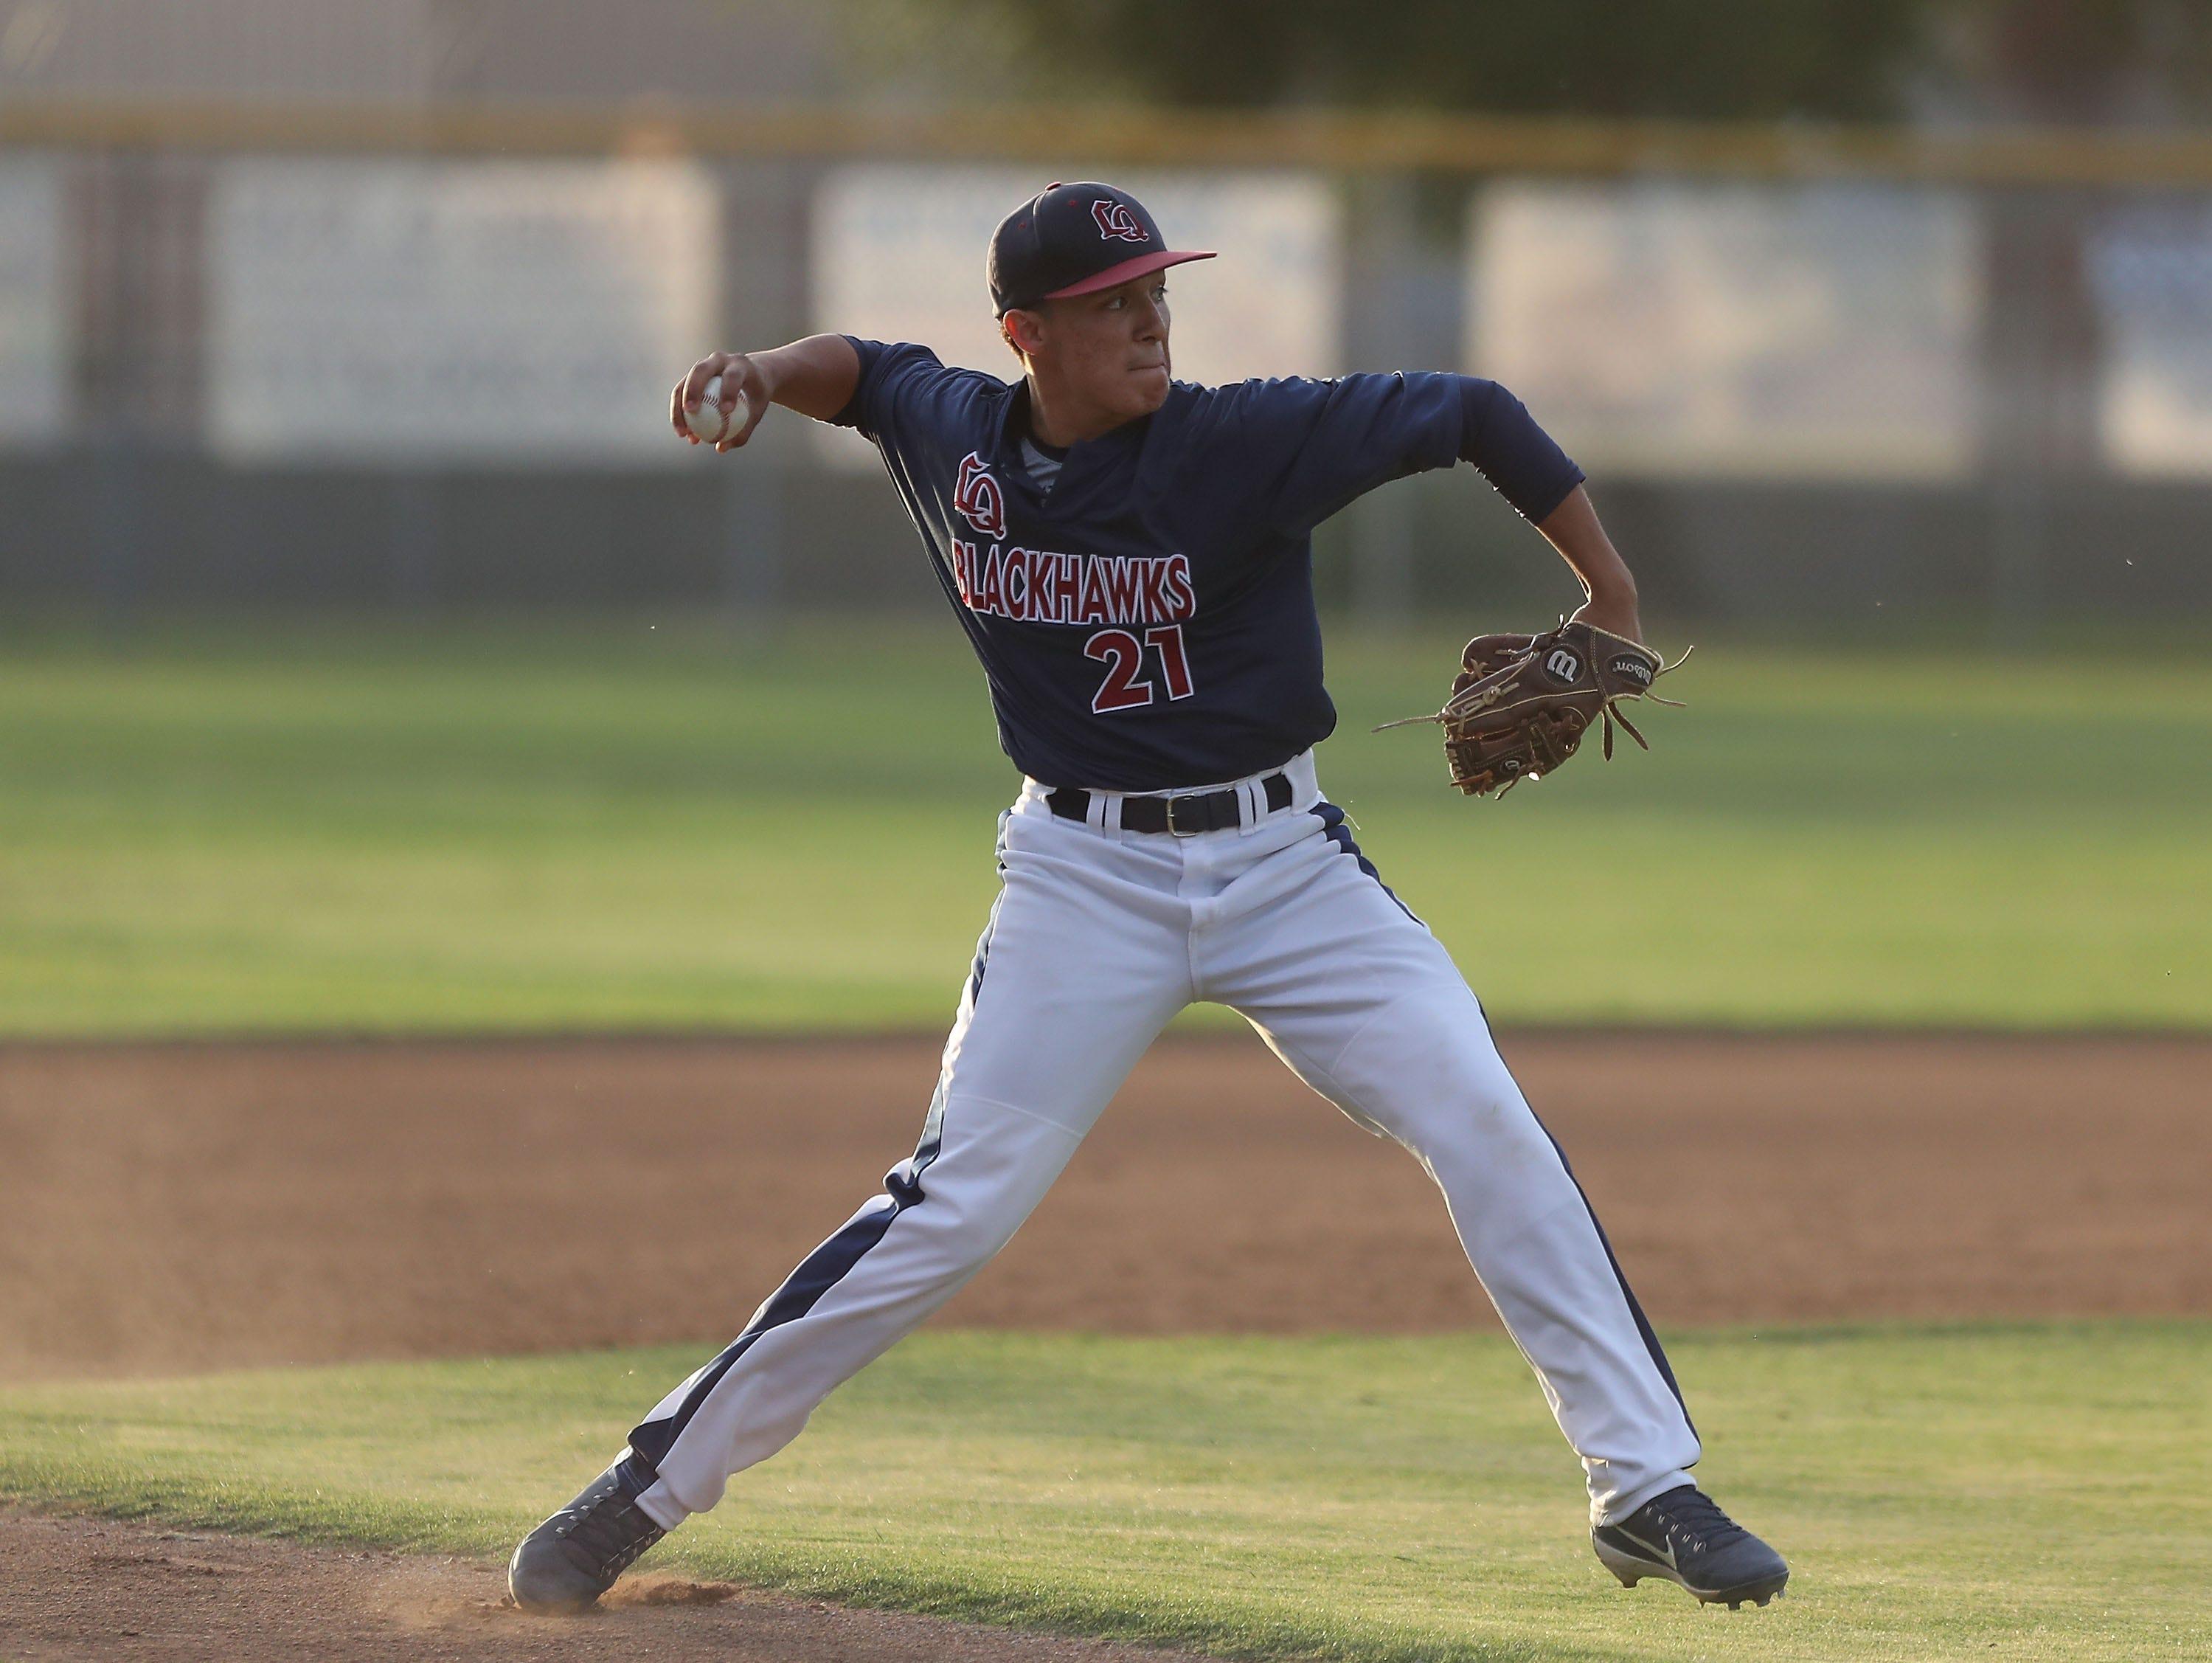 Jason Leon of La Quinta fields a ground ball versus Palm Desert, April 15, 2019.